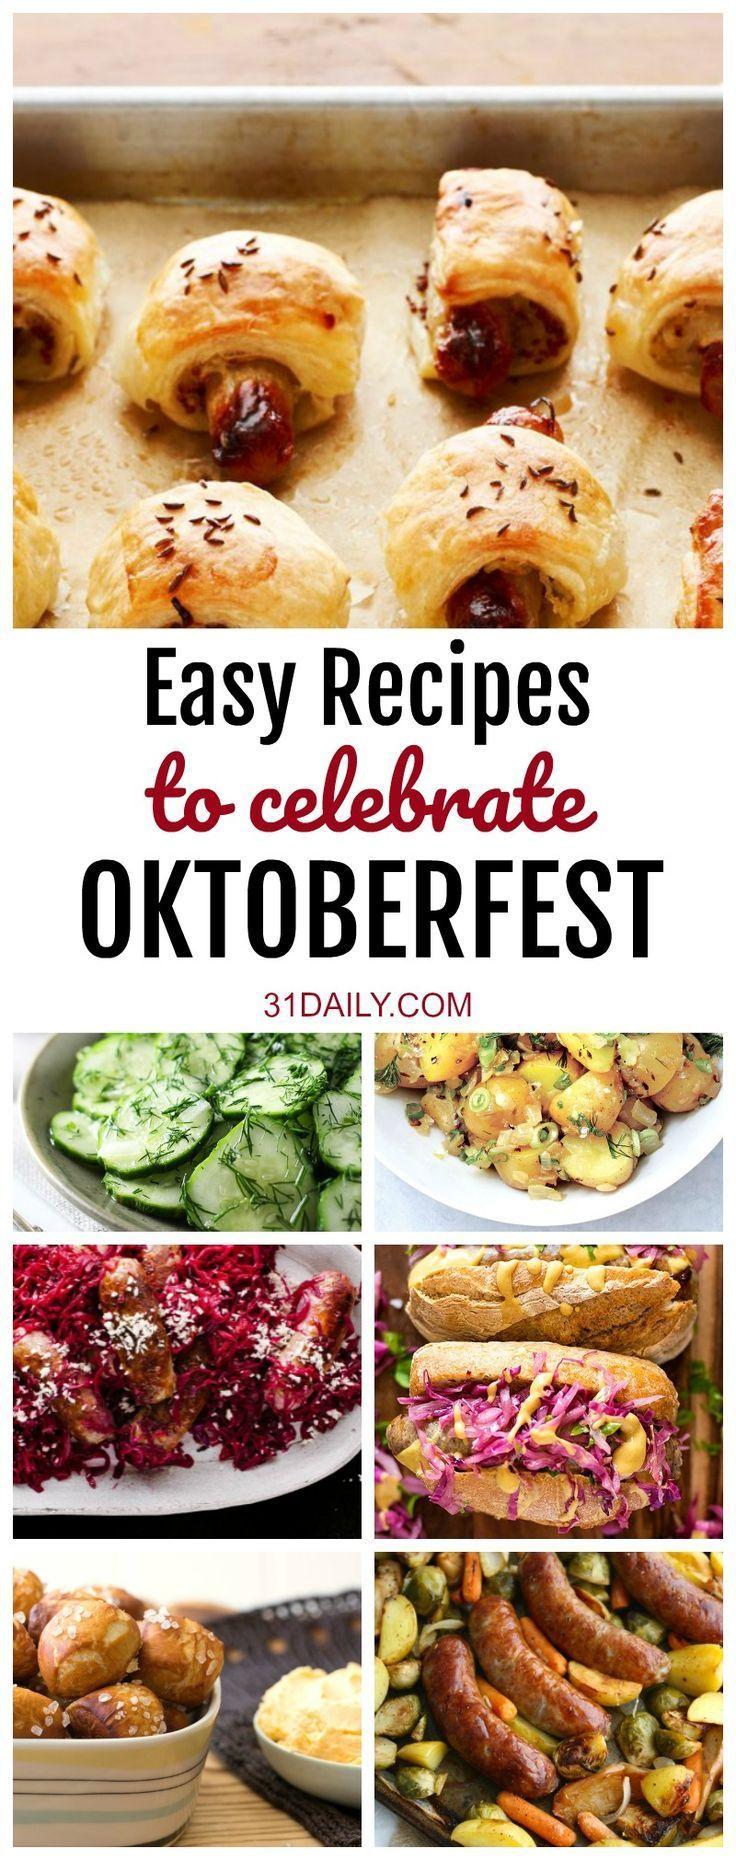 Easy German Recipes to Celebrate Oktoberfest – oktoberfest